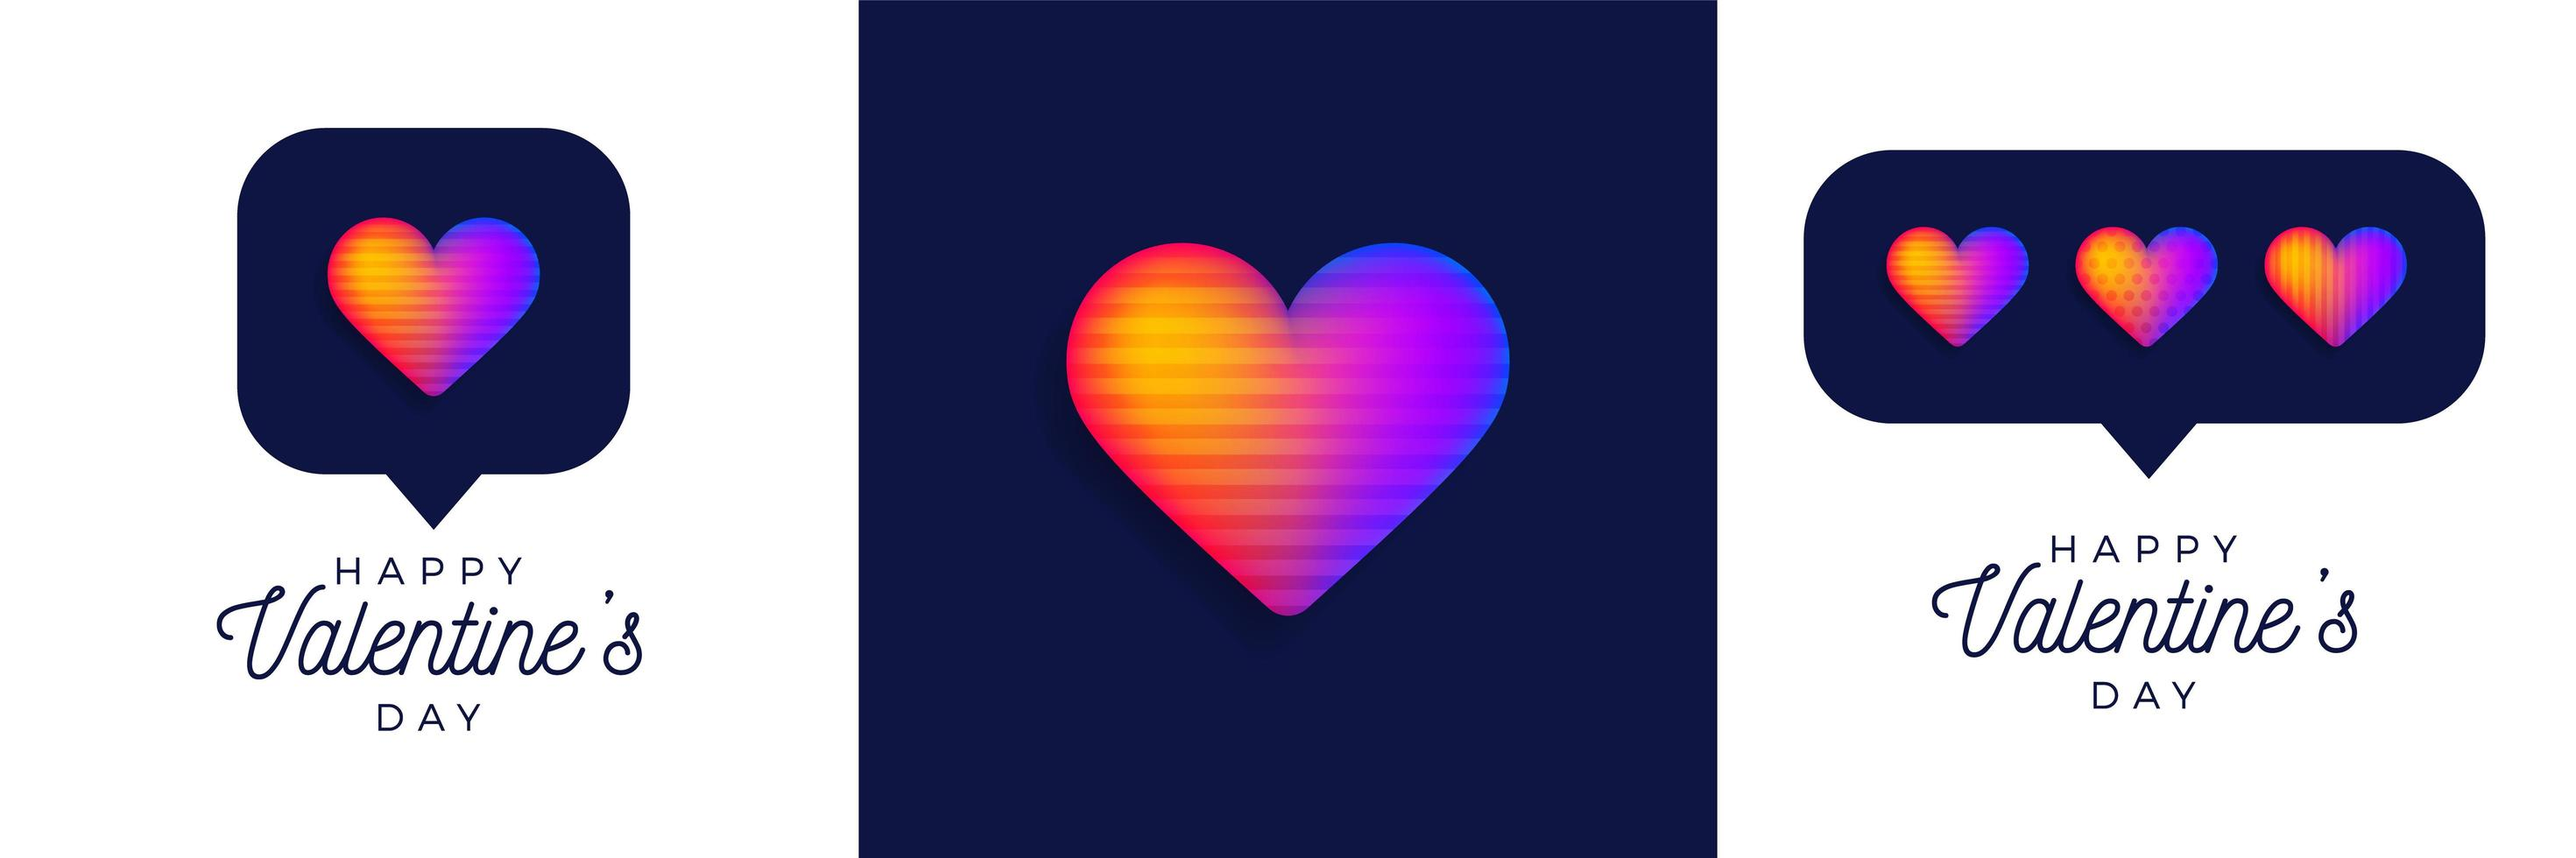 arco iris corazón conjunto de san valentín vector